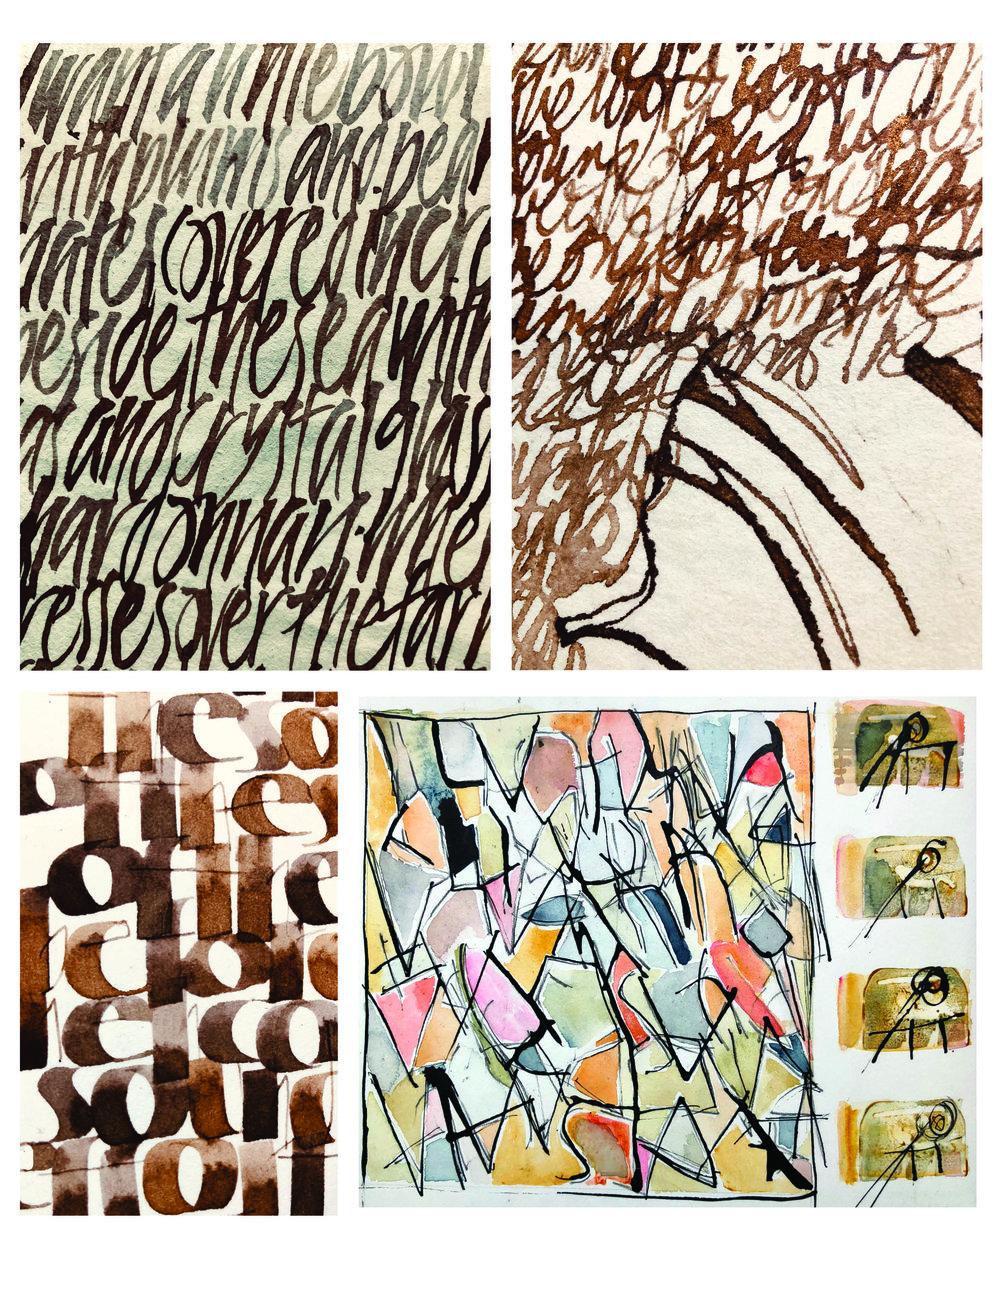 Sketchbook studies using shell, brush, pen, watercolor & ink L Doctor